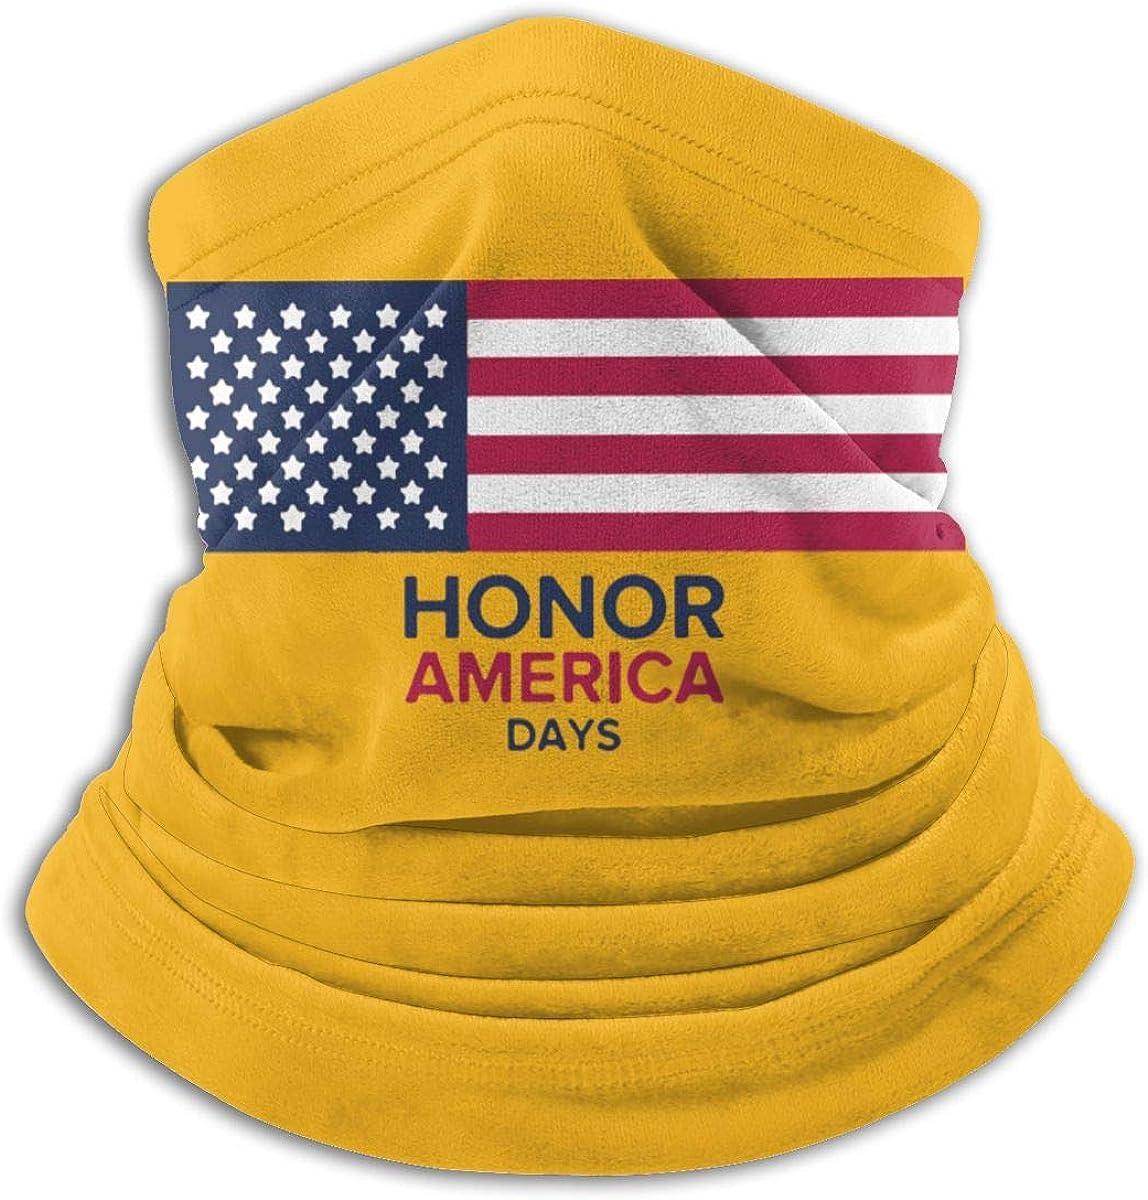 Honor America Days Black Multi-function Neck Warmer Gaiter Polyester Neck Warmer Windproof Winter Neck Gaiter Cold Weather Scarf For Men Women